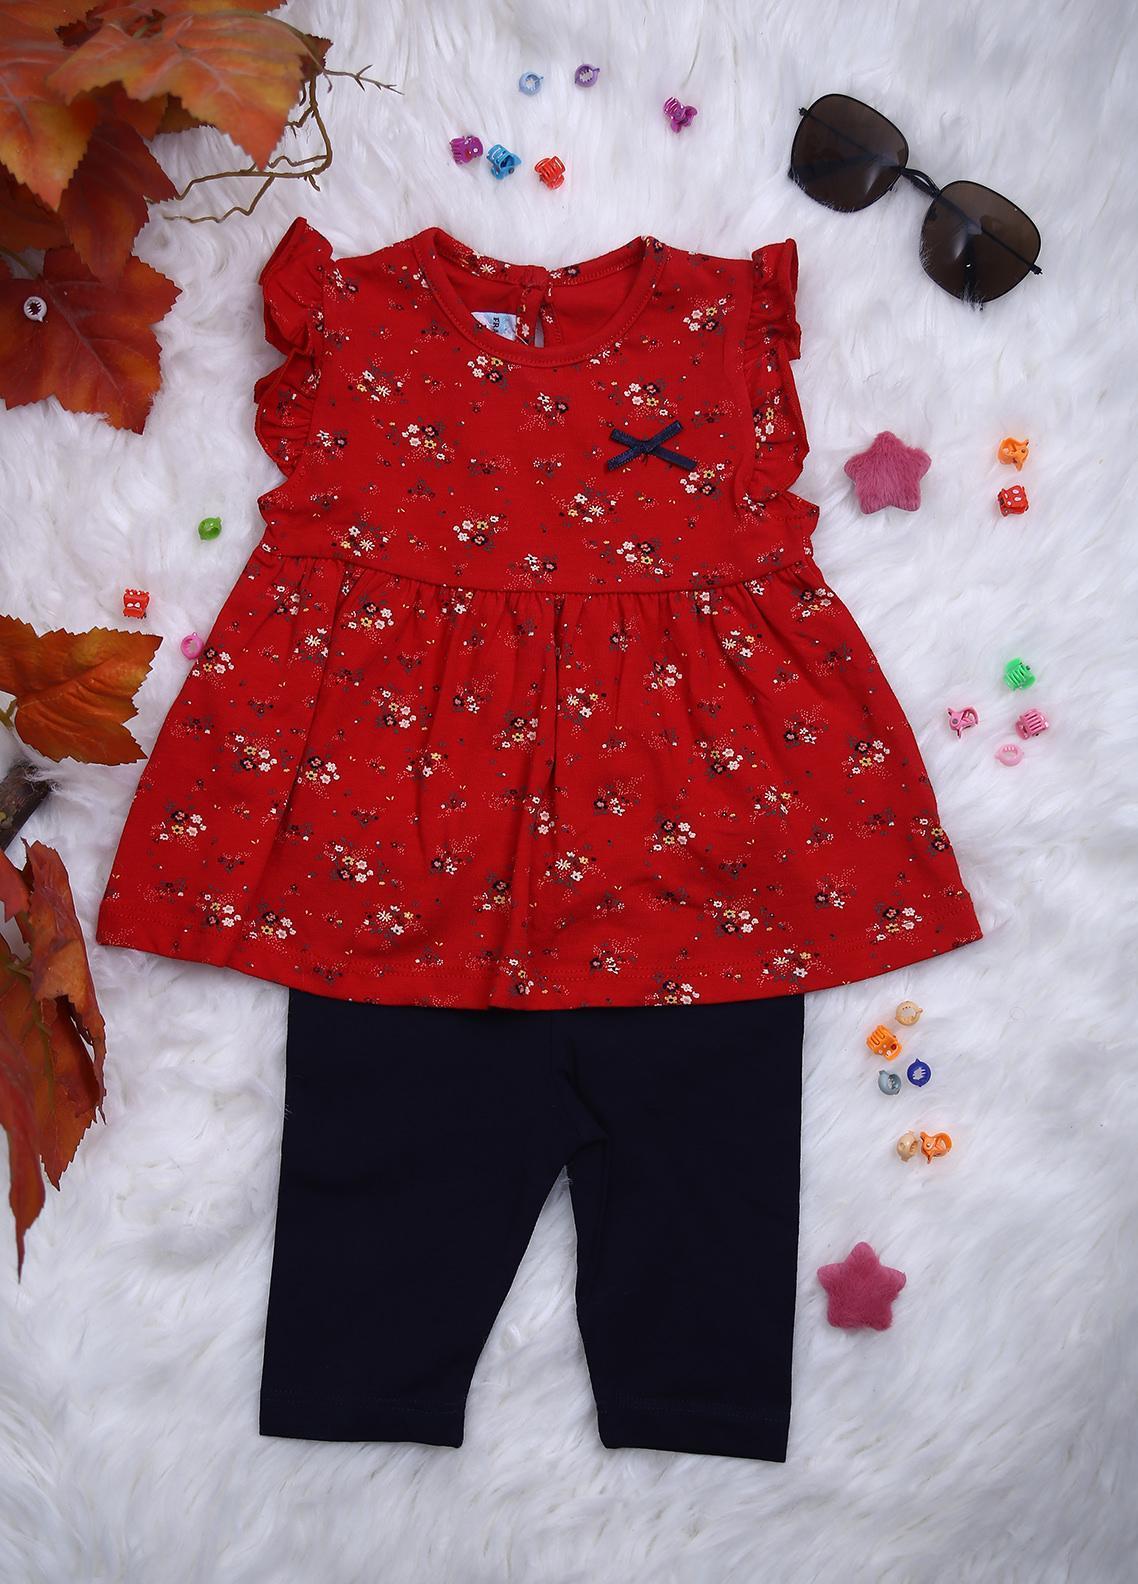 Sanaulla Exclusive Range Cotton Casual Girls 2 Piece -  114625 Red